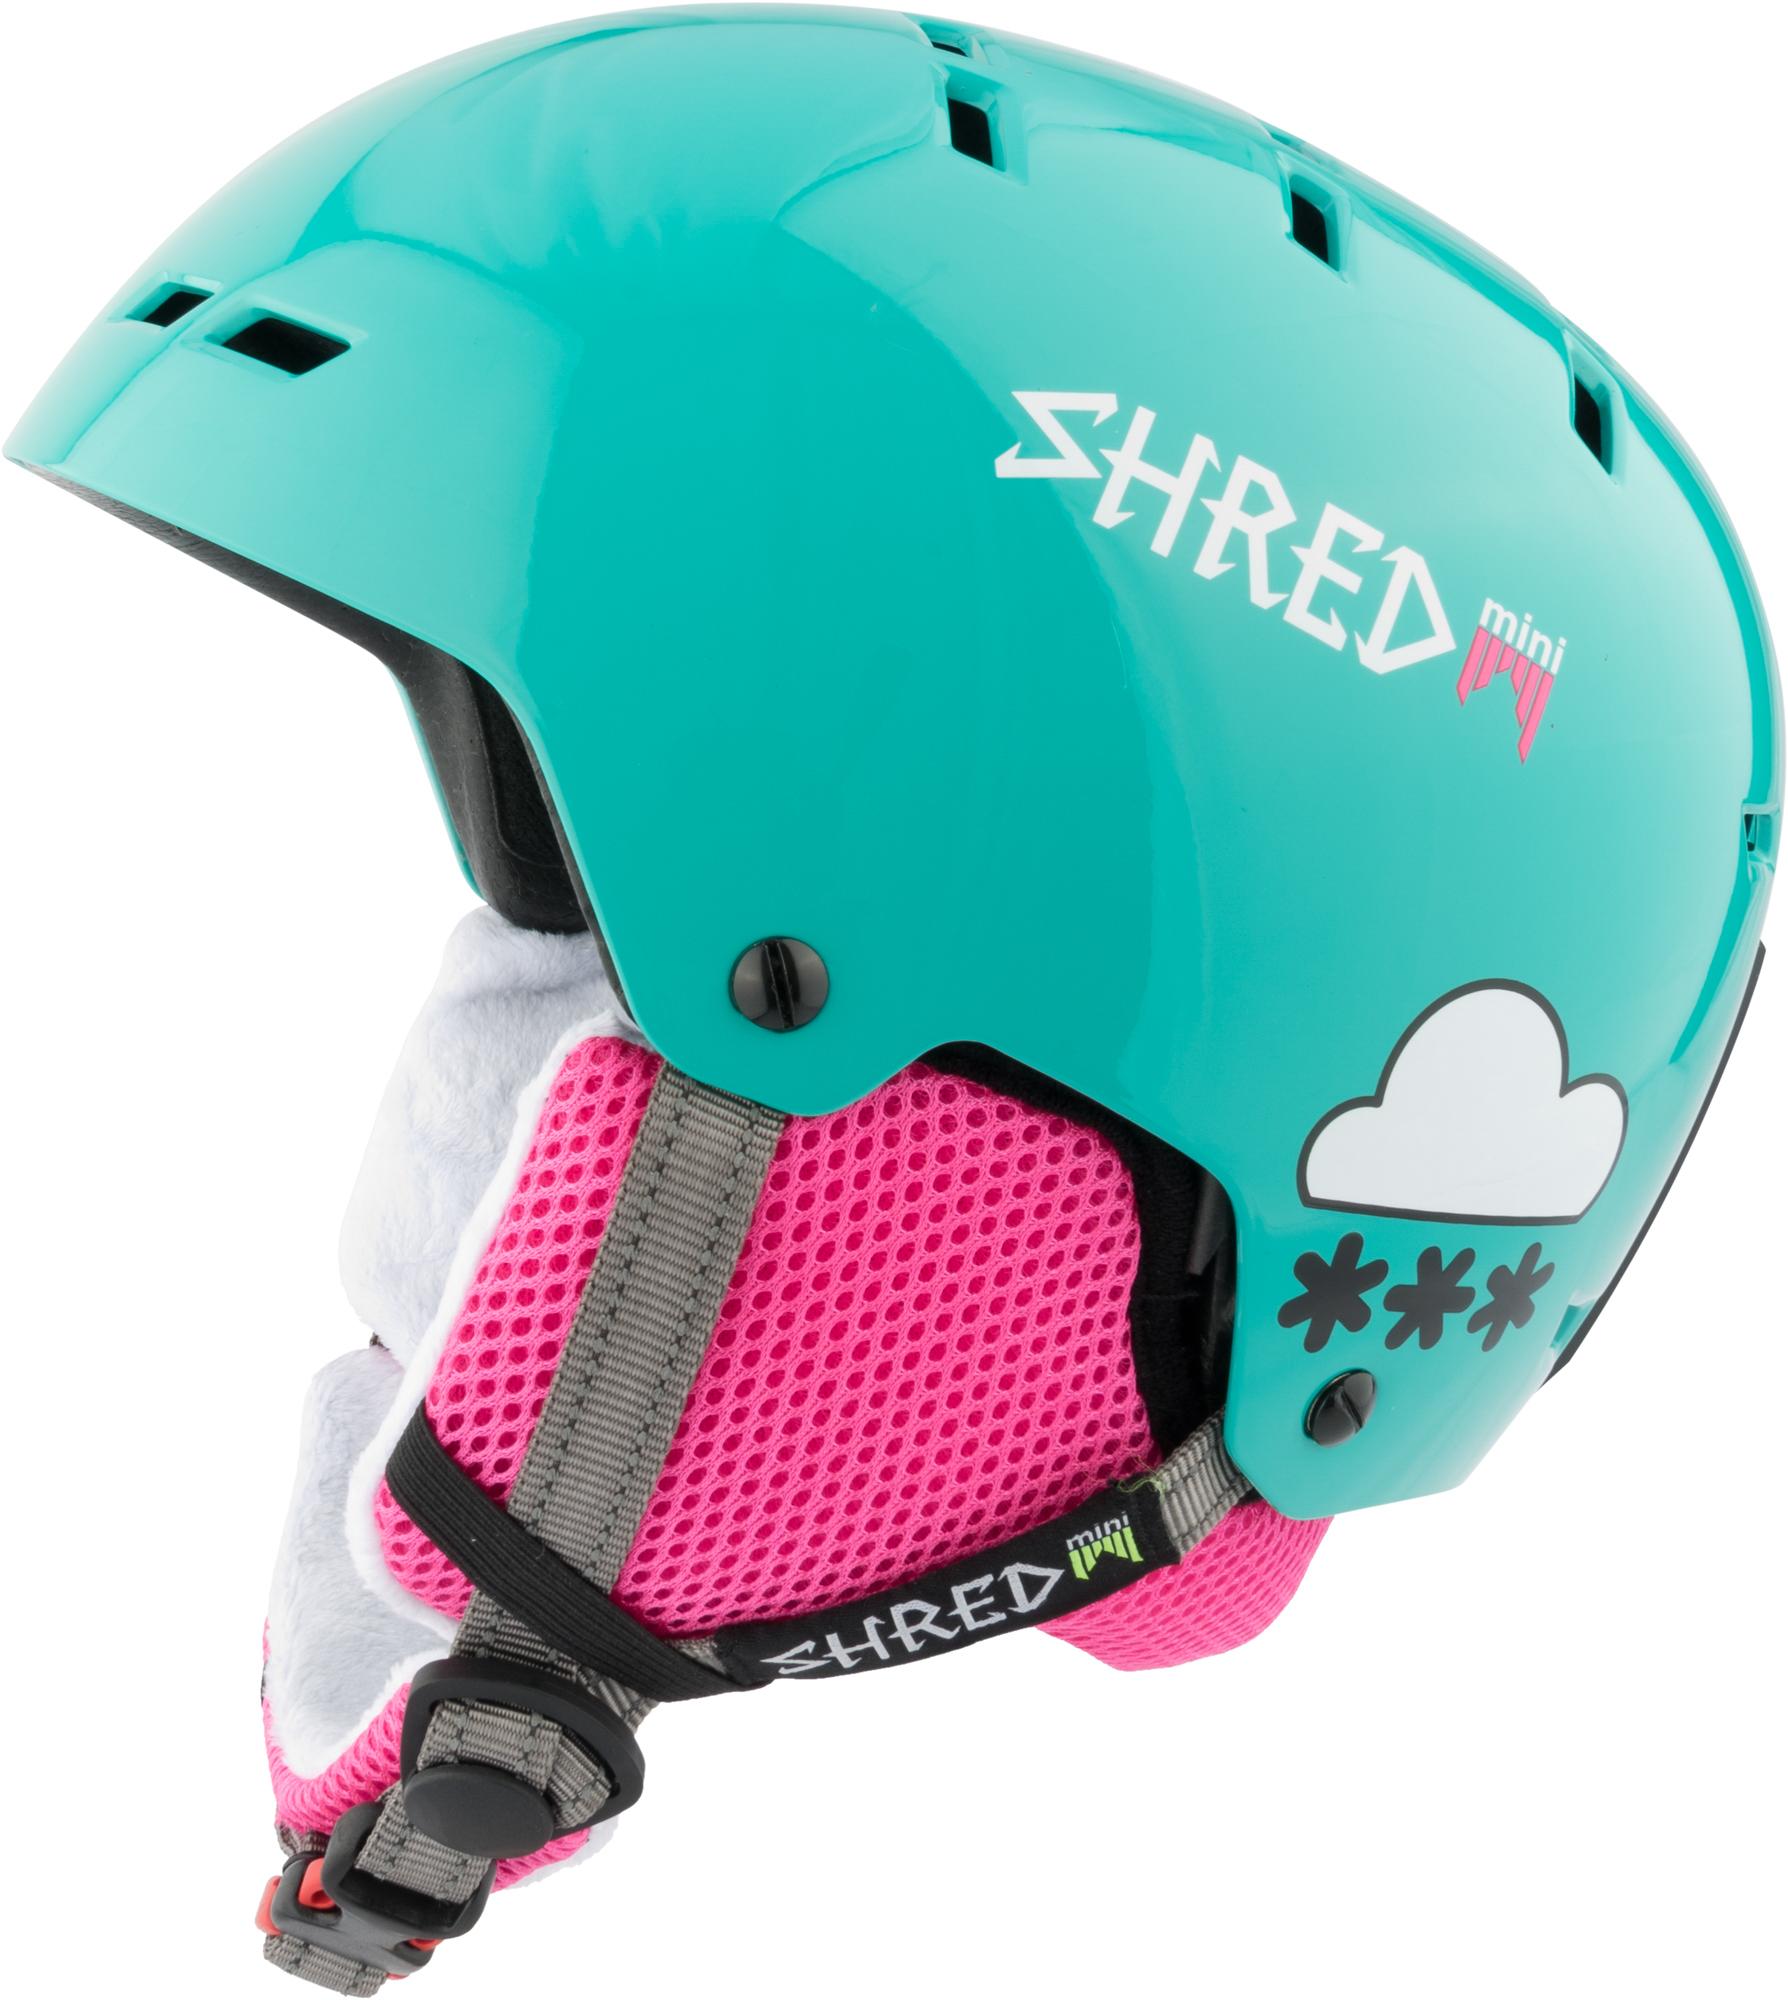 Shred ski helmet snowboard helmet of green bumper Noshock Slytech X-static® 65a6f0d23f2